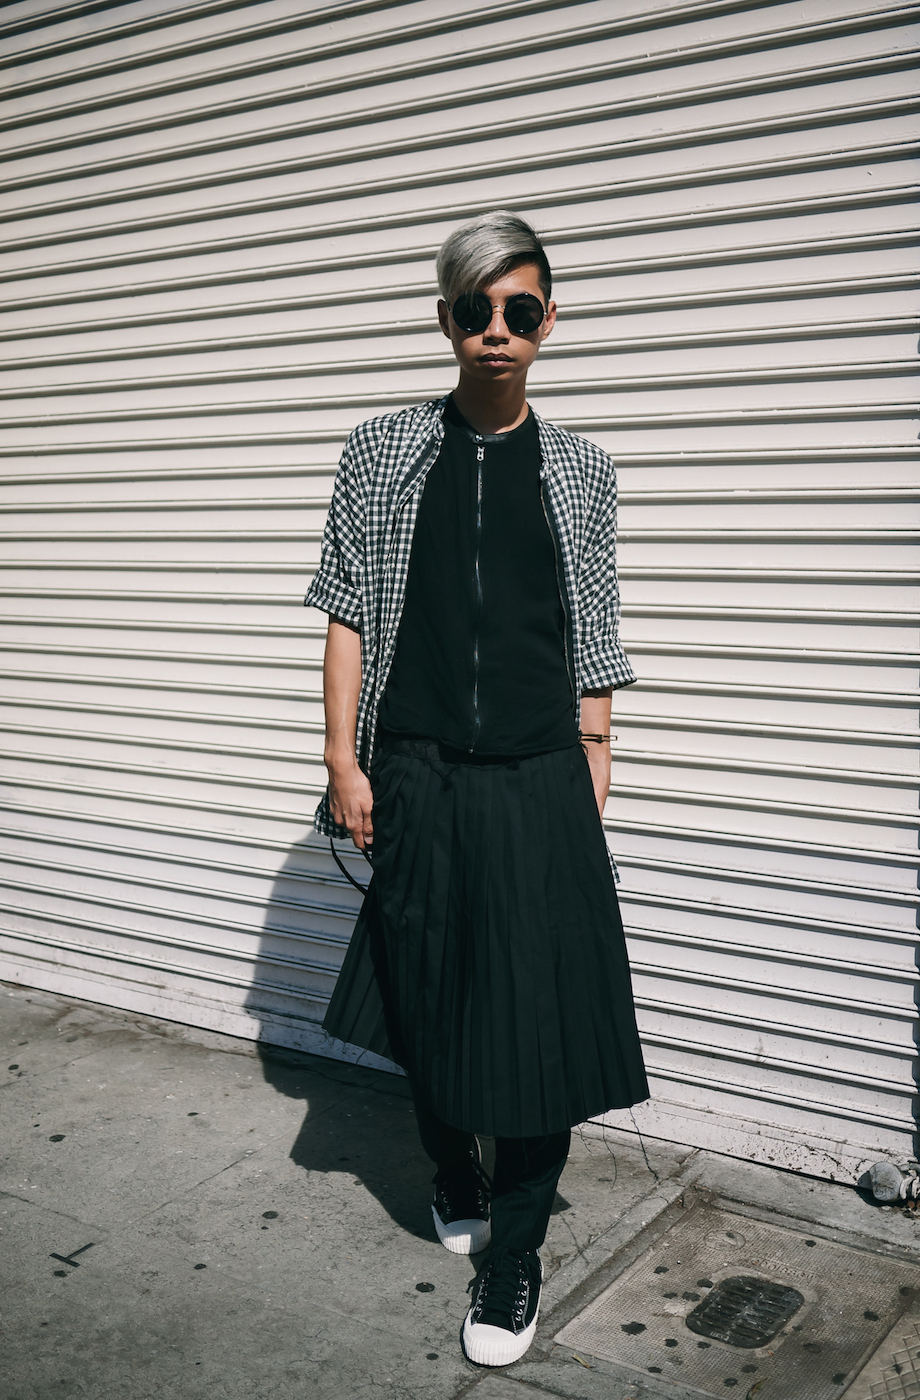 mybelonging-tommylei-minimal-streetstyle-men-in-skirts-13.jpg